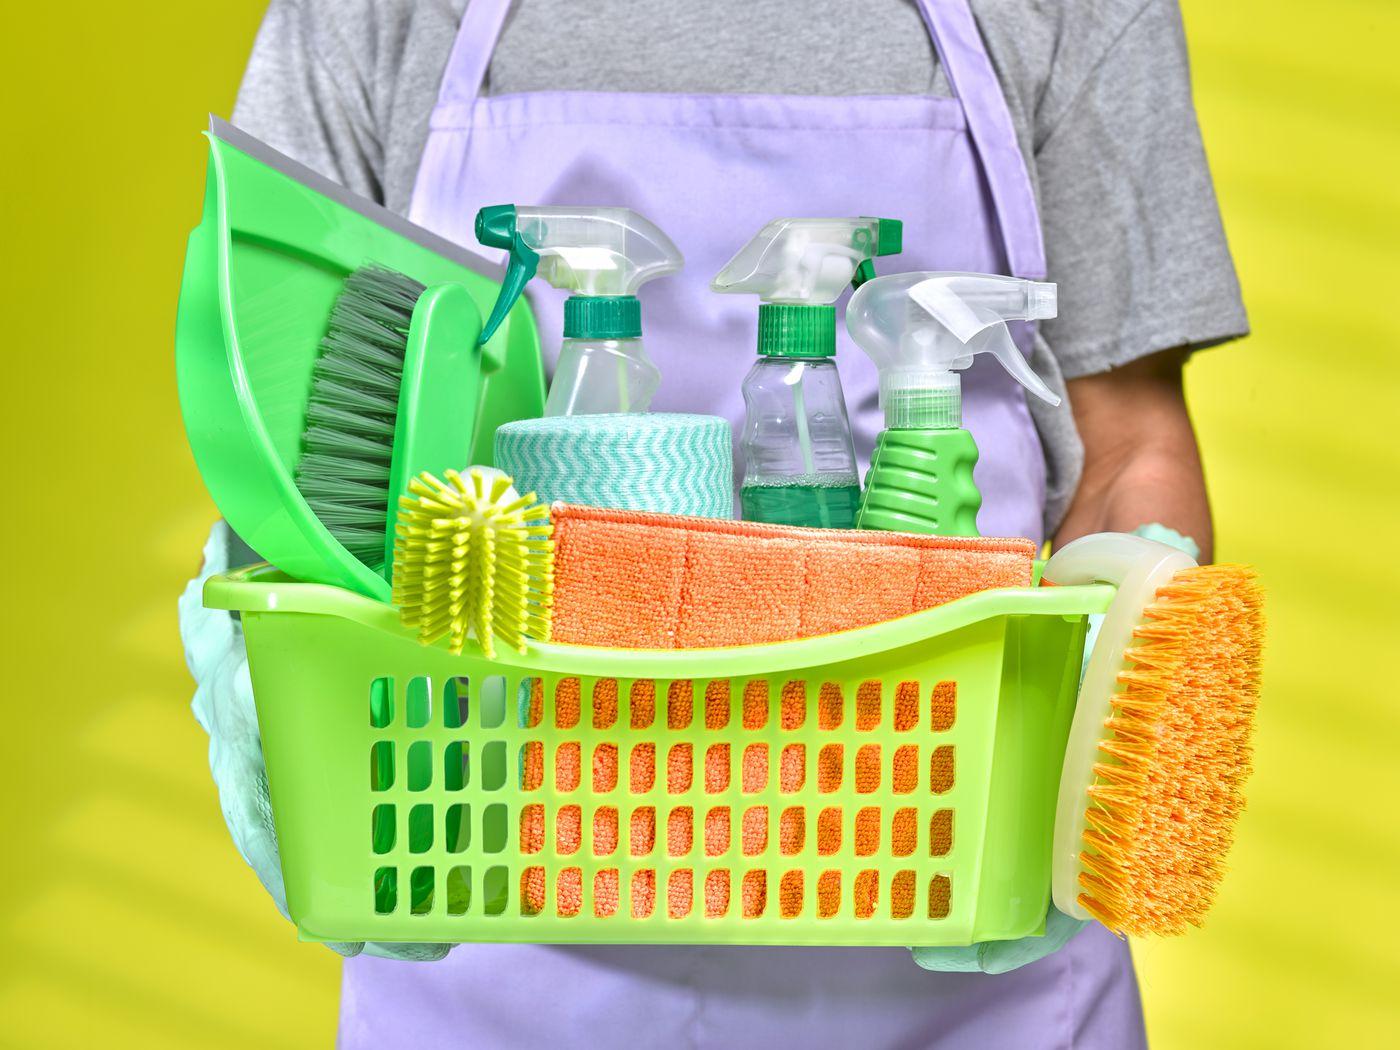 dr. clo malaysia hygiene